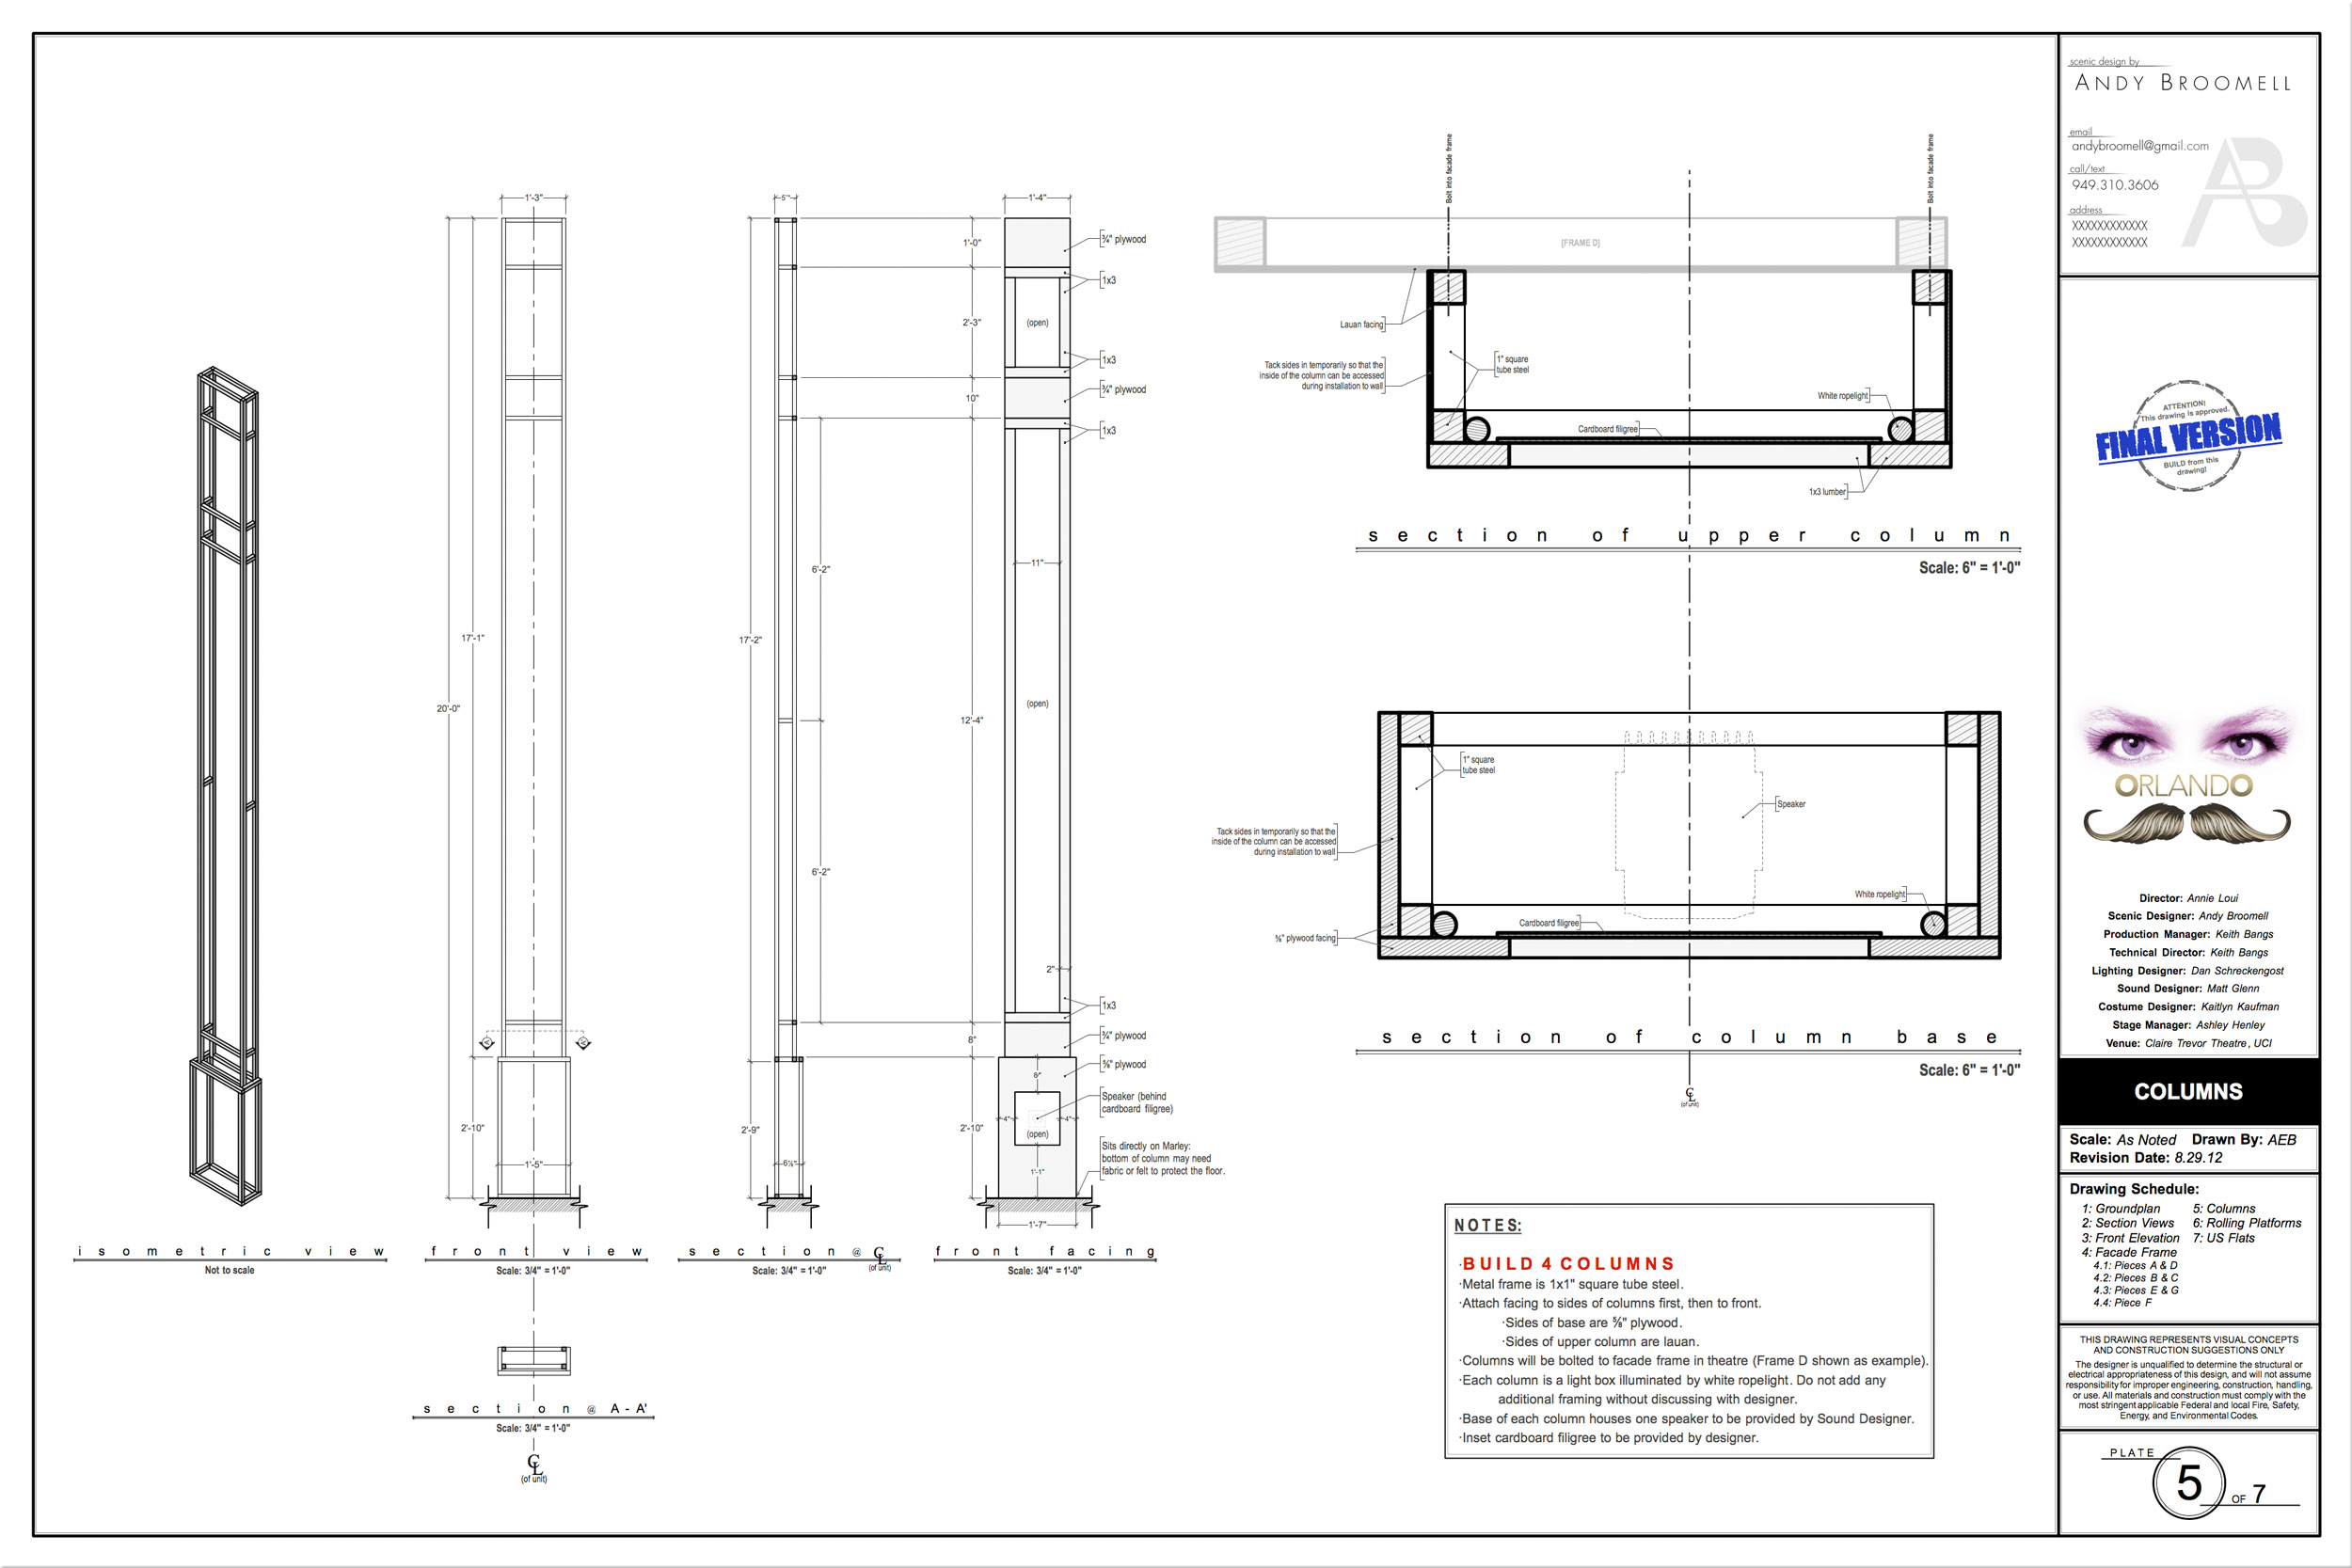 andy-broomell-scenic-design-drafting-orlando-5.jpg